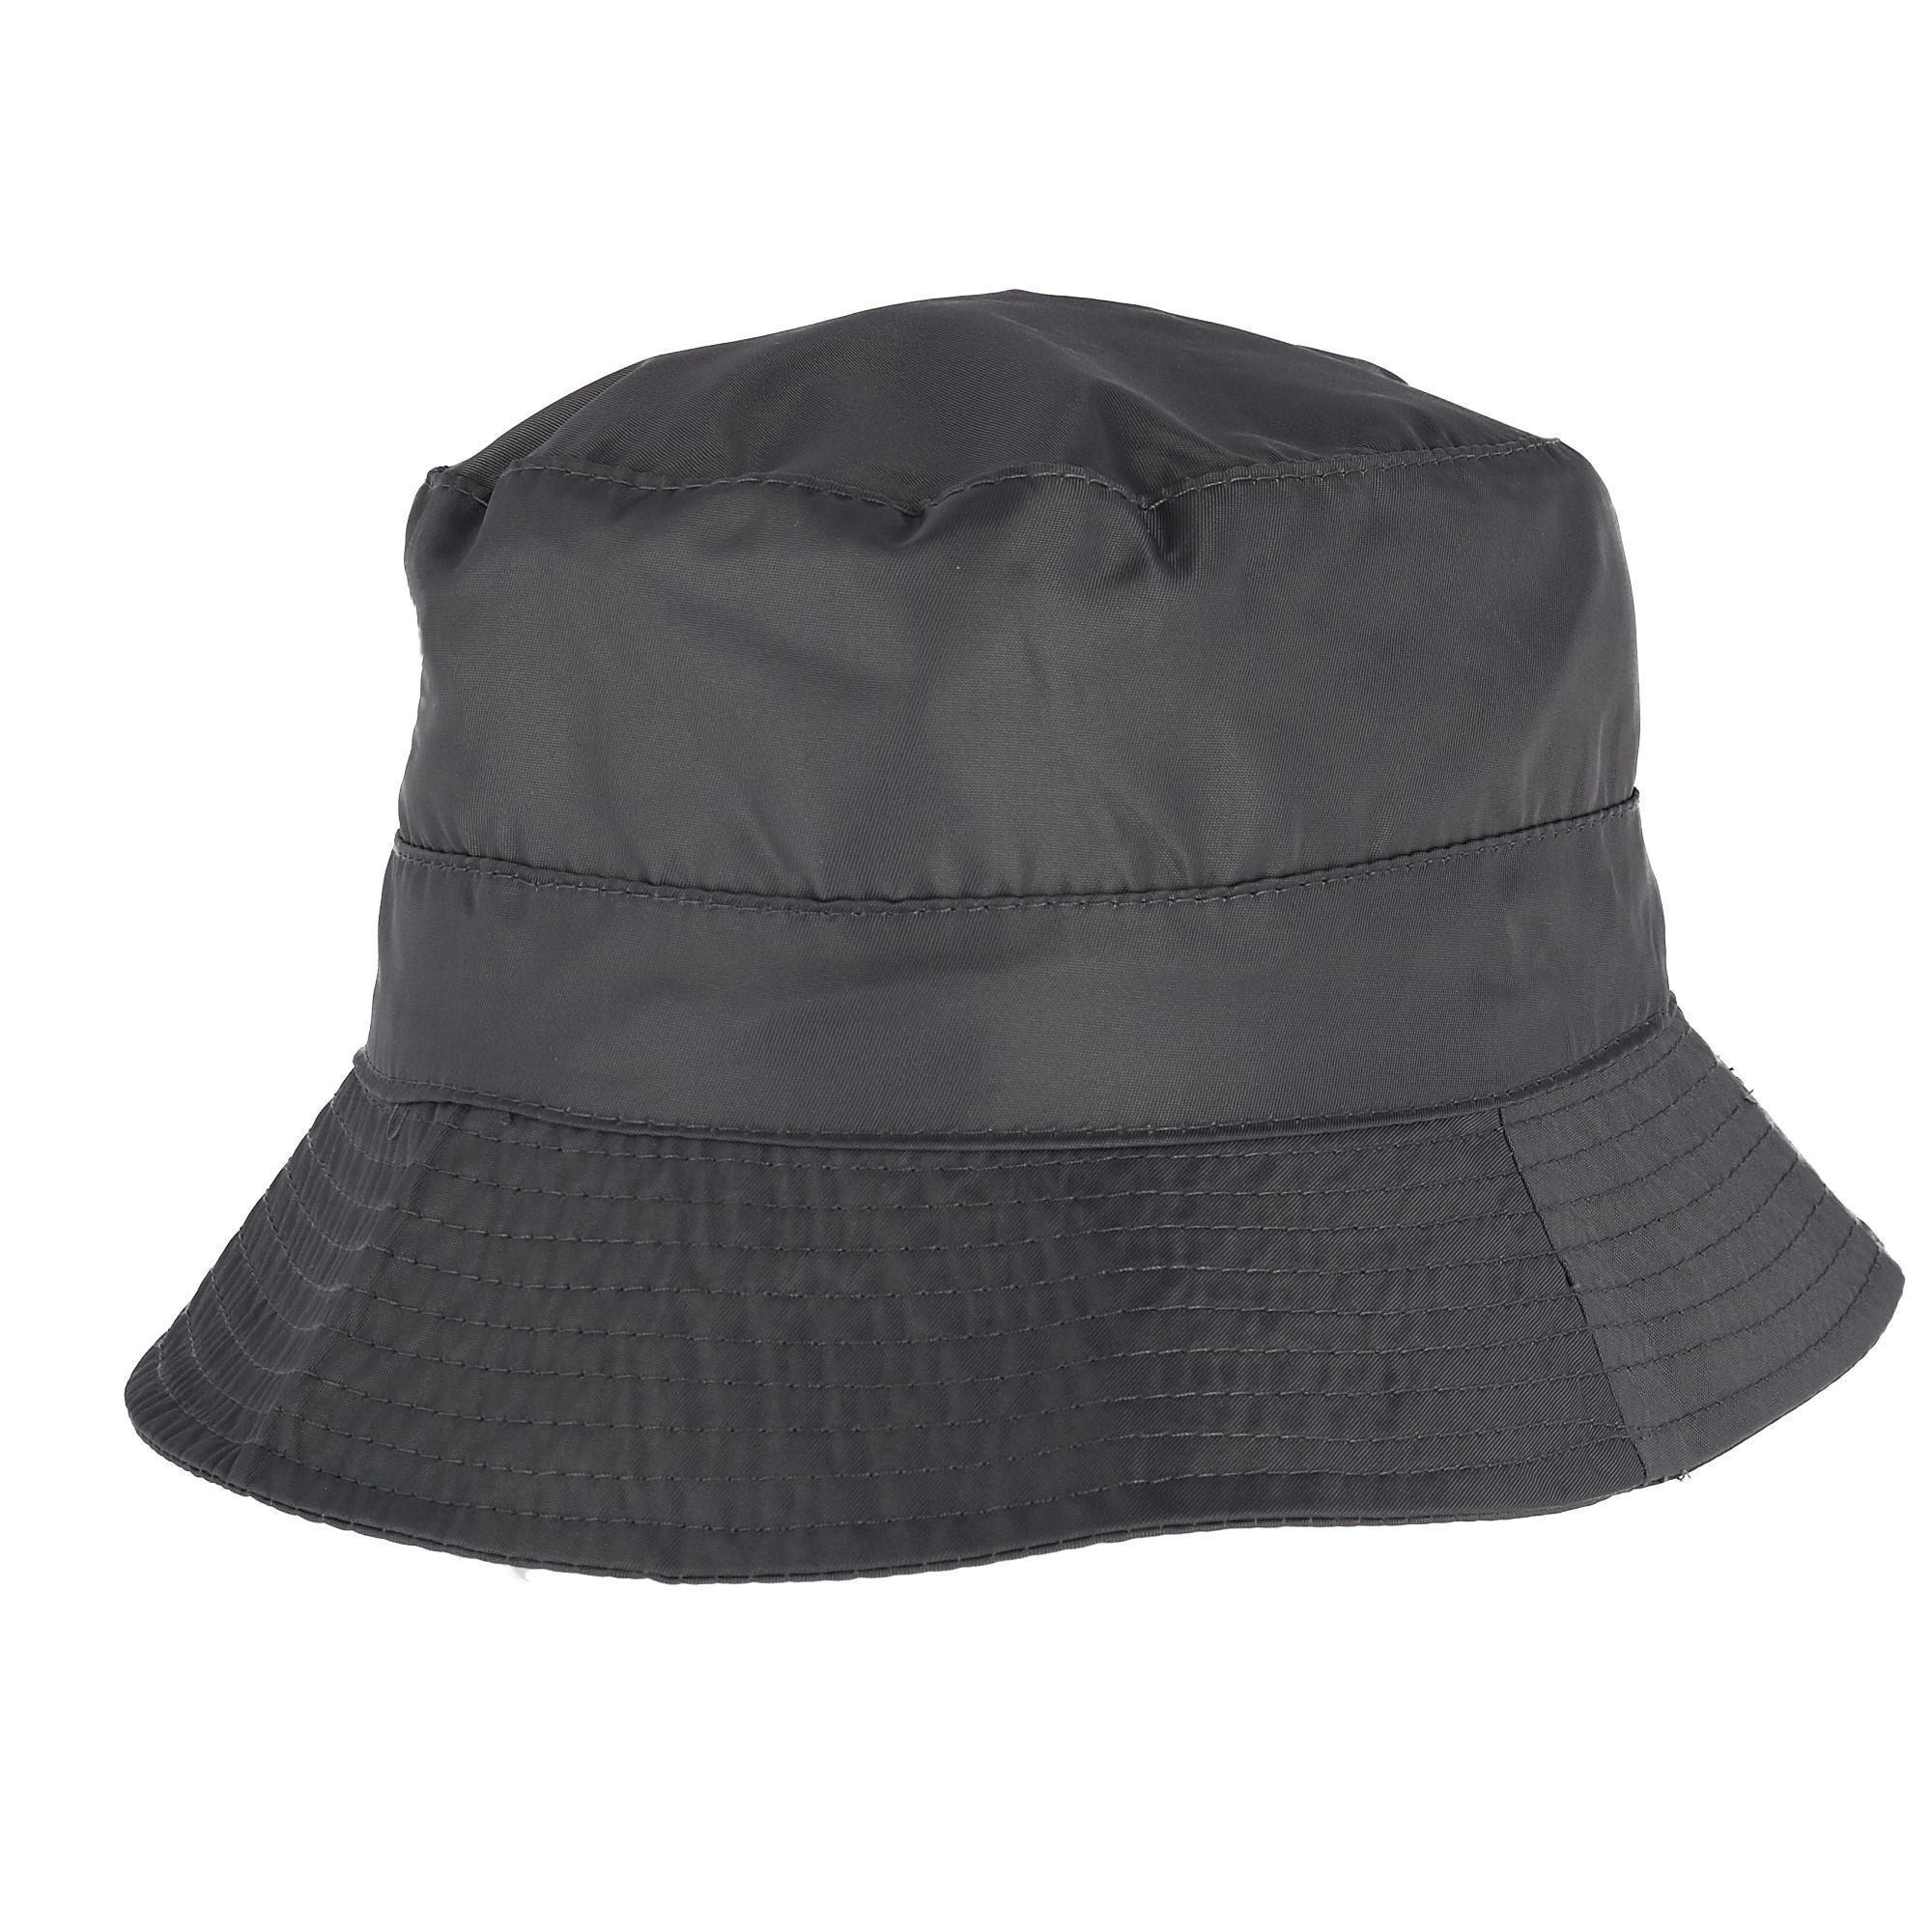 3945adee New Angela & William Women's Waterproof Packable Rain Hat with Zippered  Closure